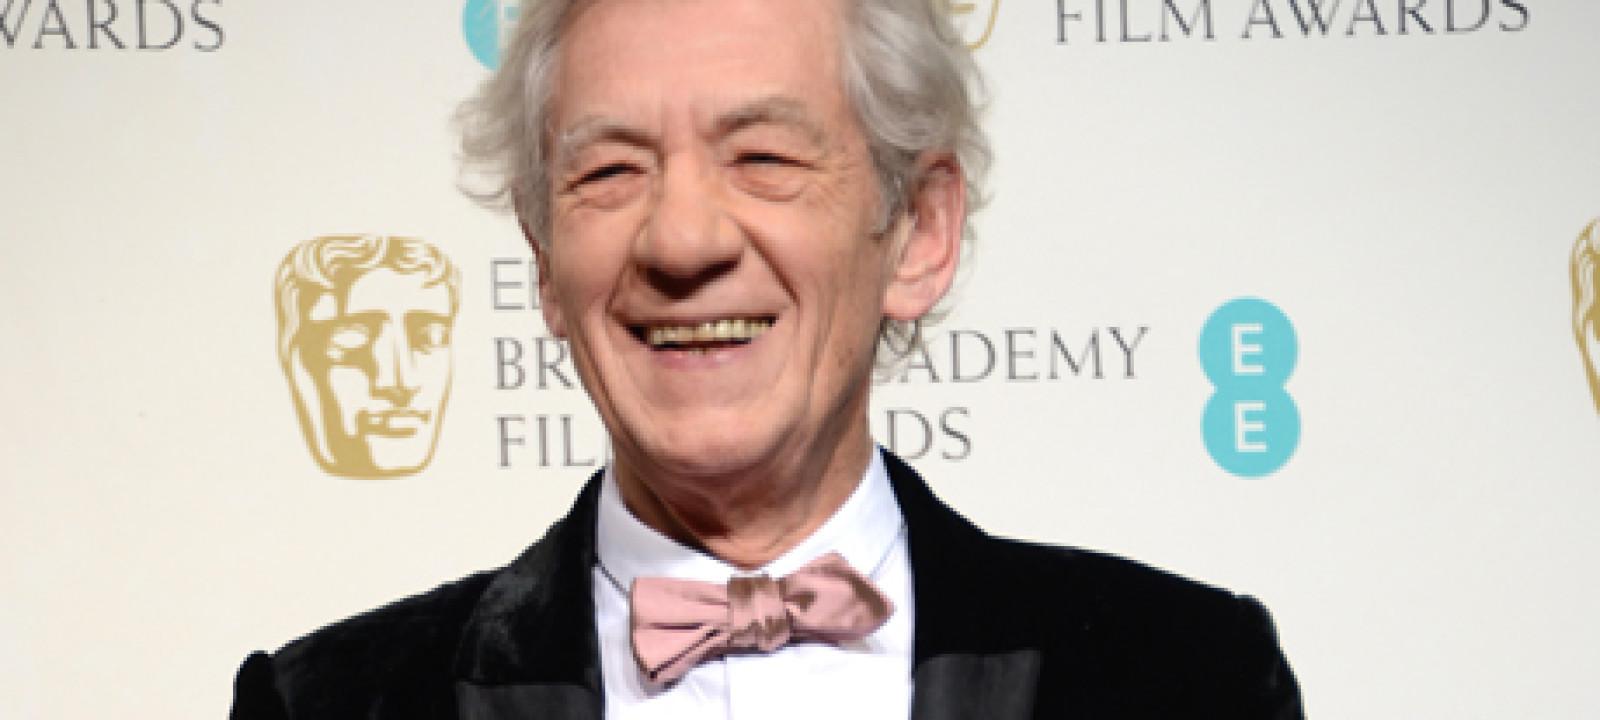 EE British Academy Film Awards, Press Room, Royal Opera House, L